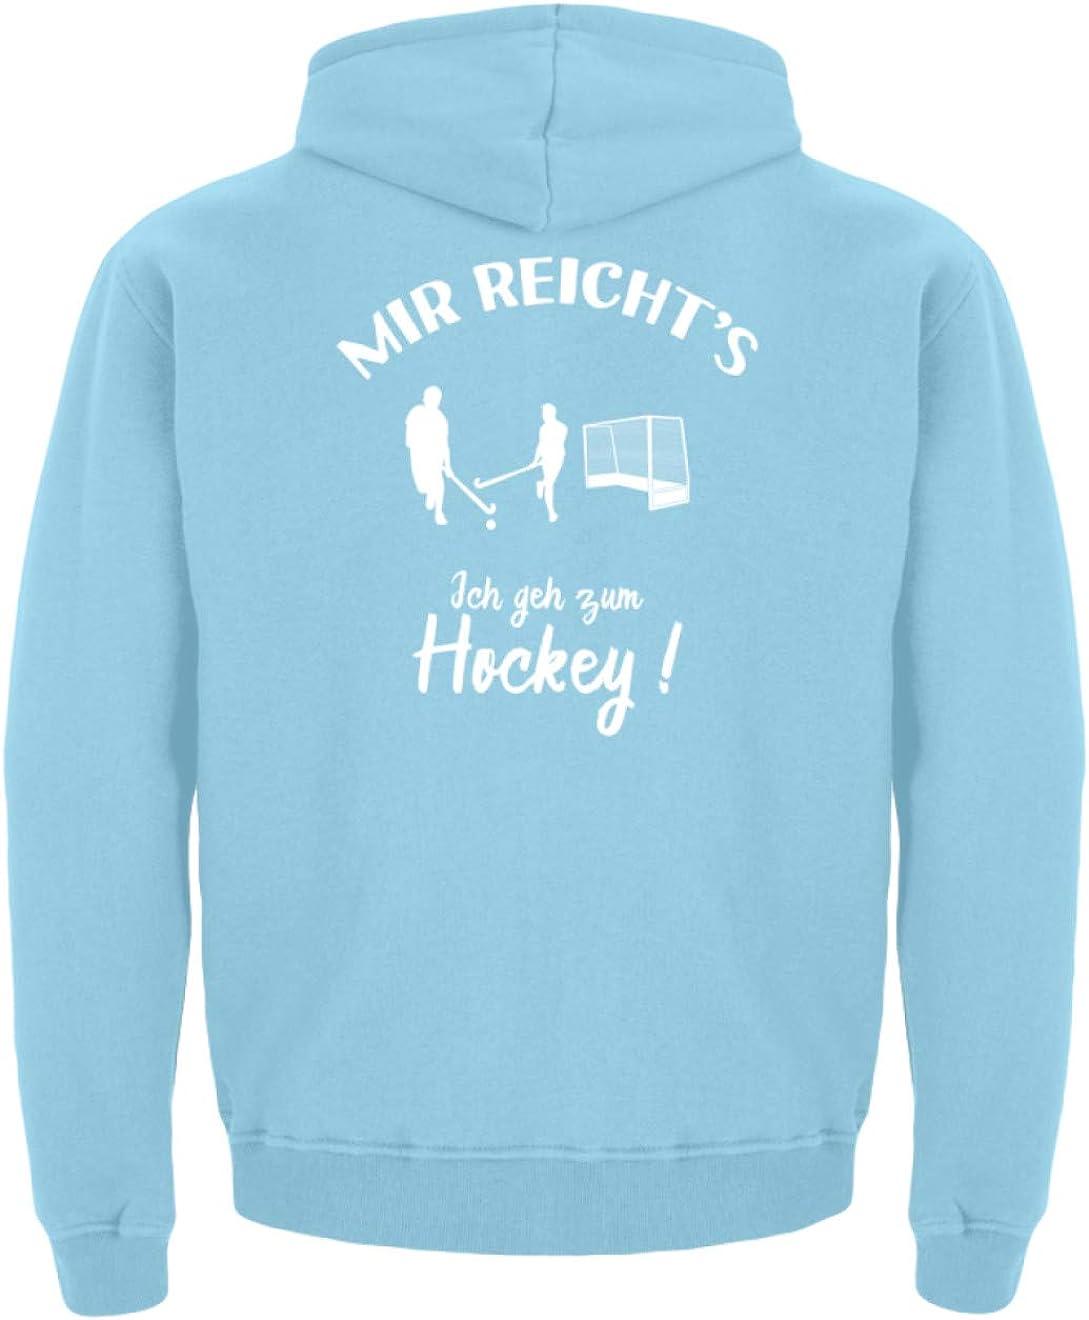 shirt-o-magic Hockeyspieler Kinder Hoodie Ich GEH zum Hockey!